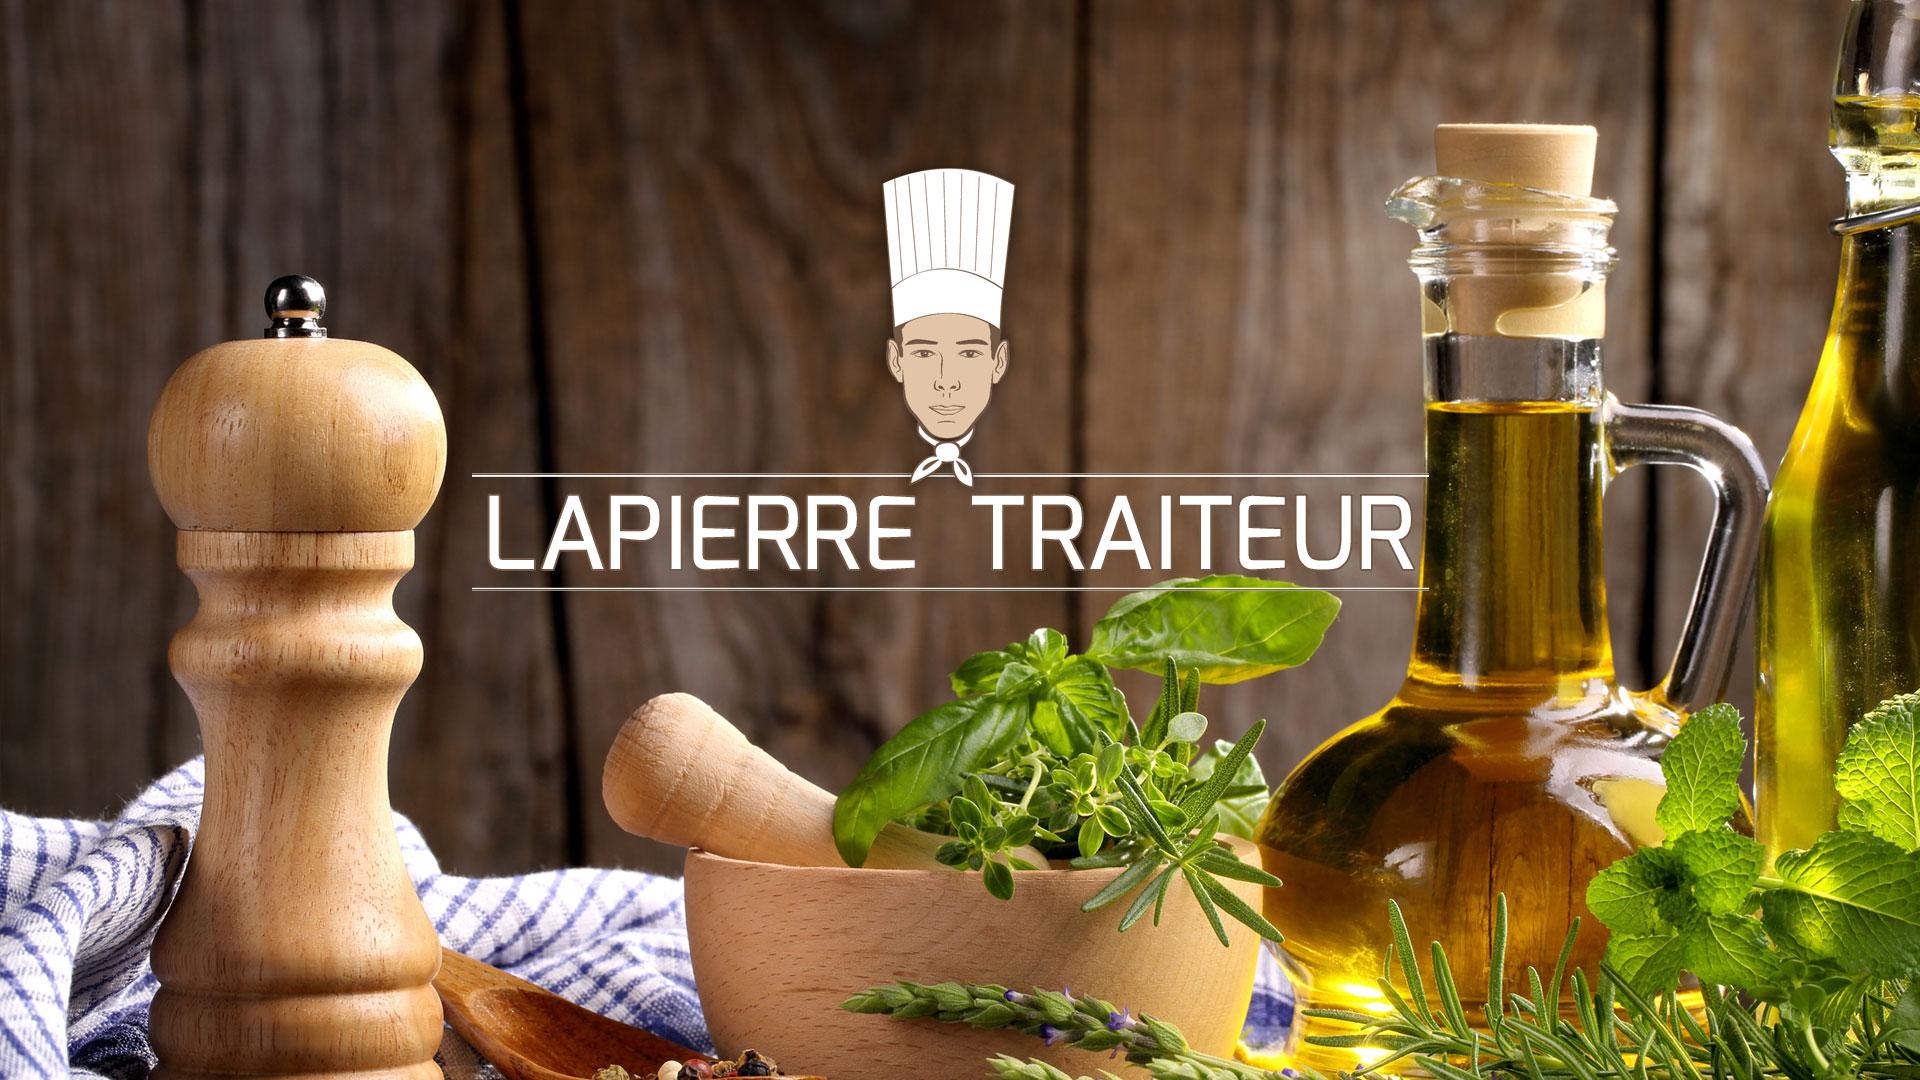 diapo_lapierretraiteur1